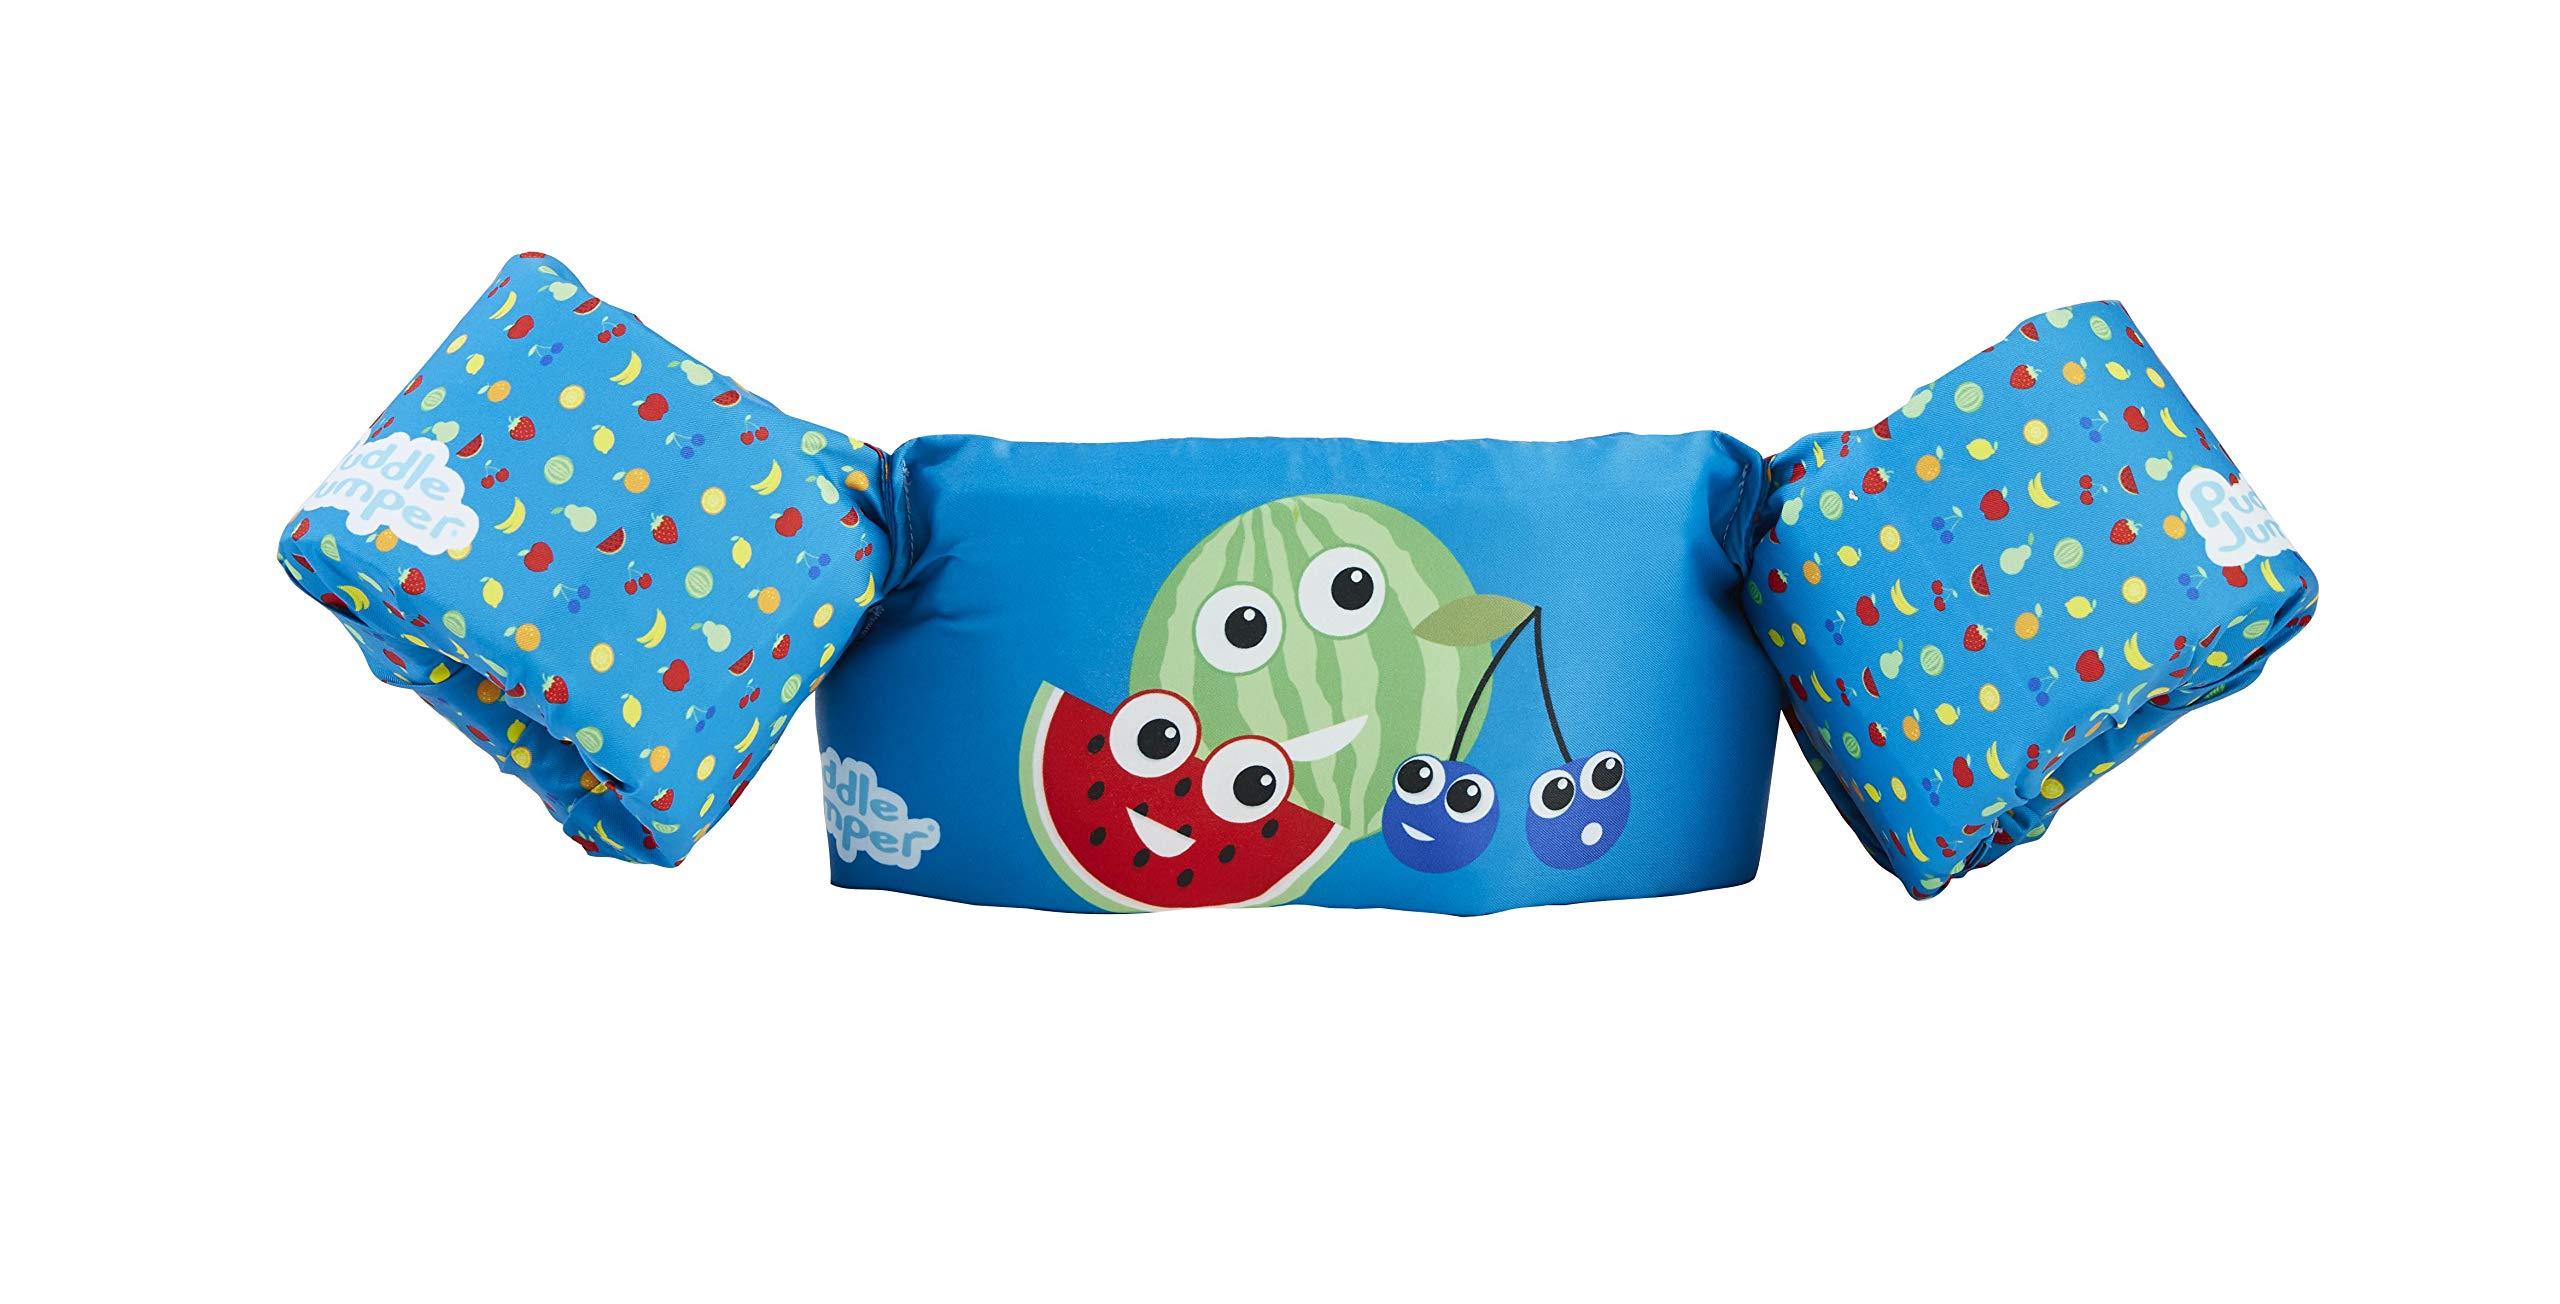 Stearns Puddle Jumper Kids Life Jacket   Life Vest for Children, Mixed Fruit, 30-50 Pounds